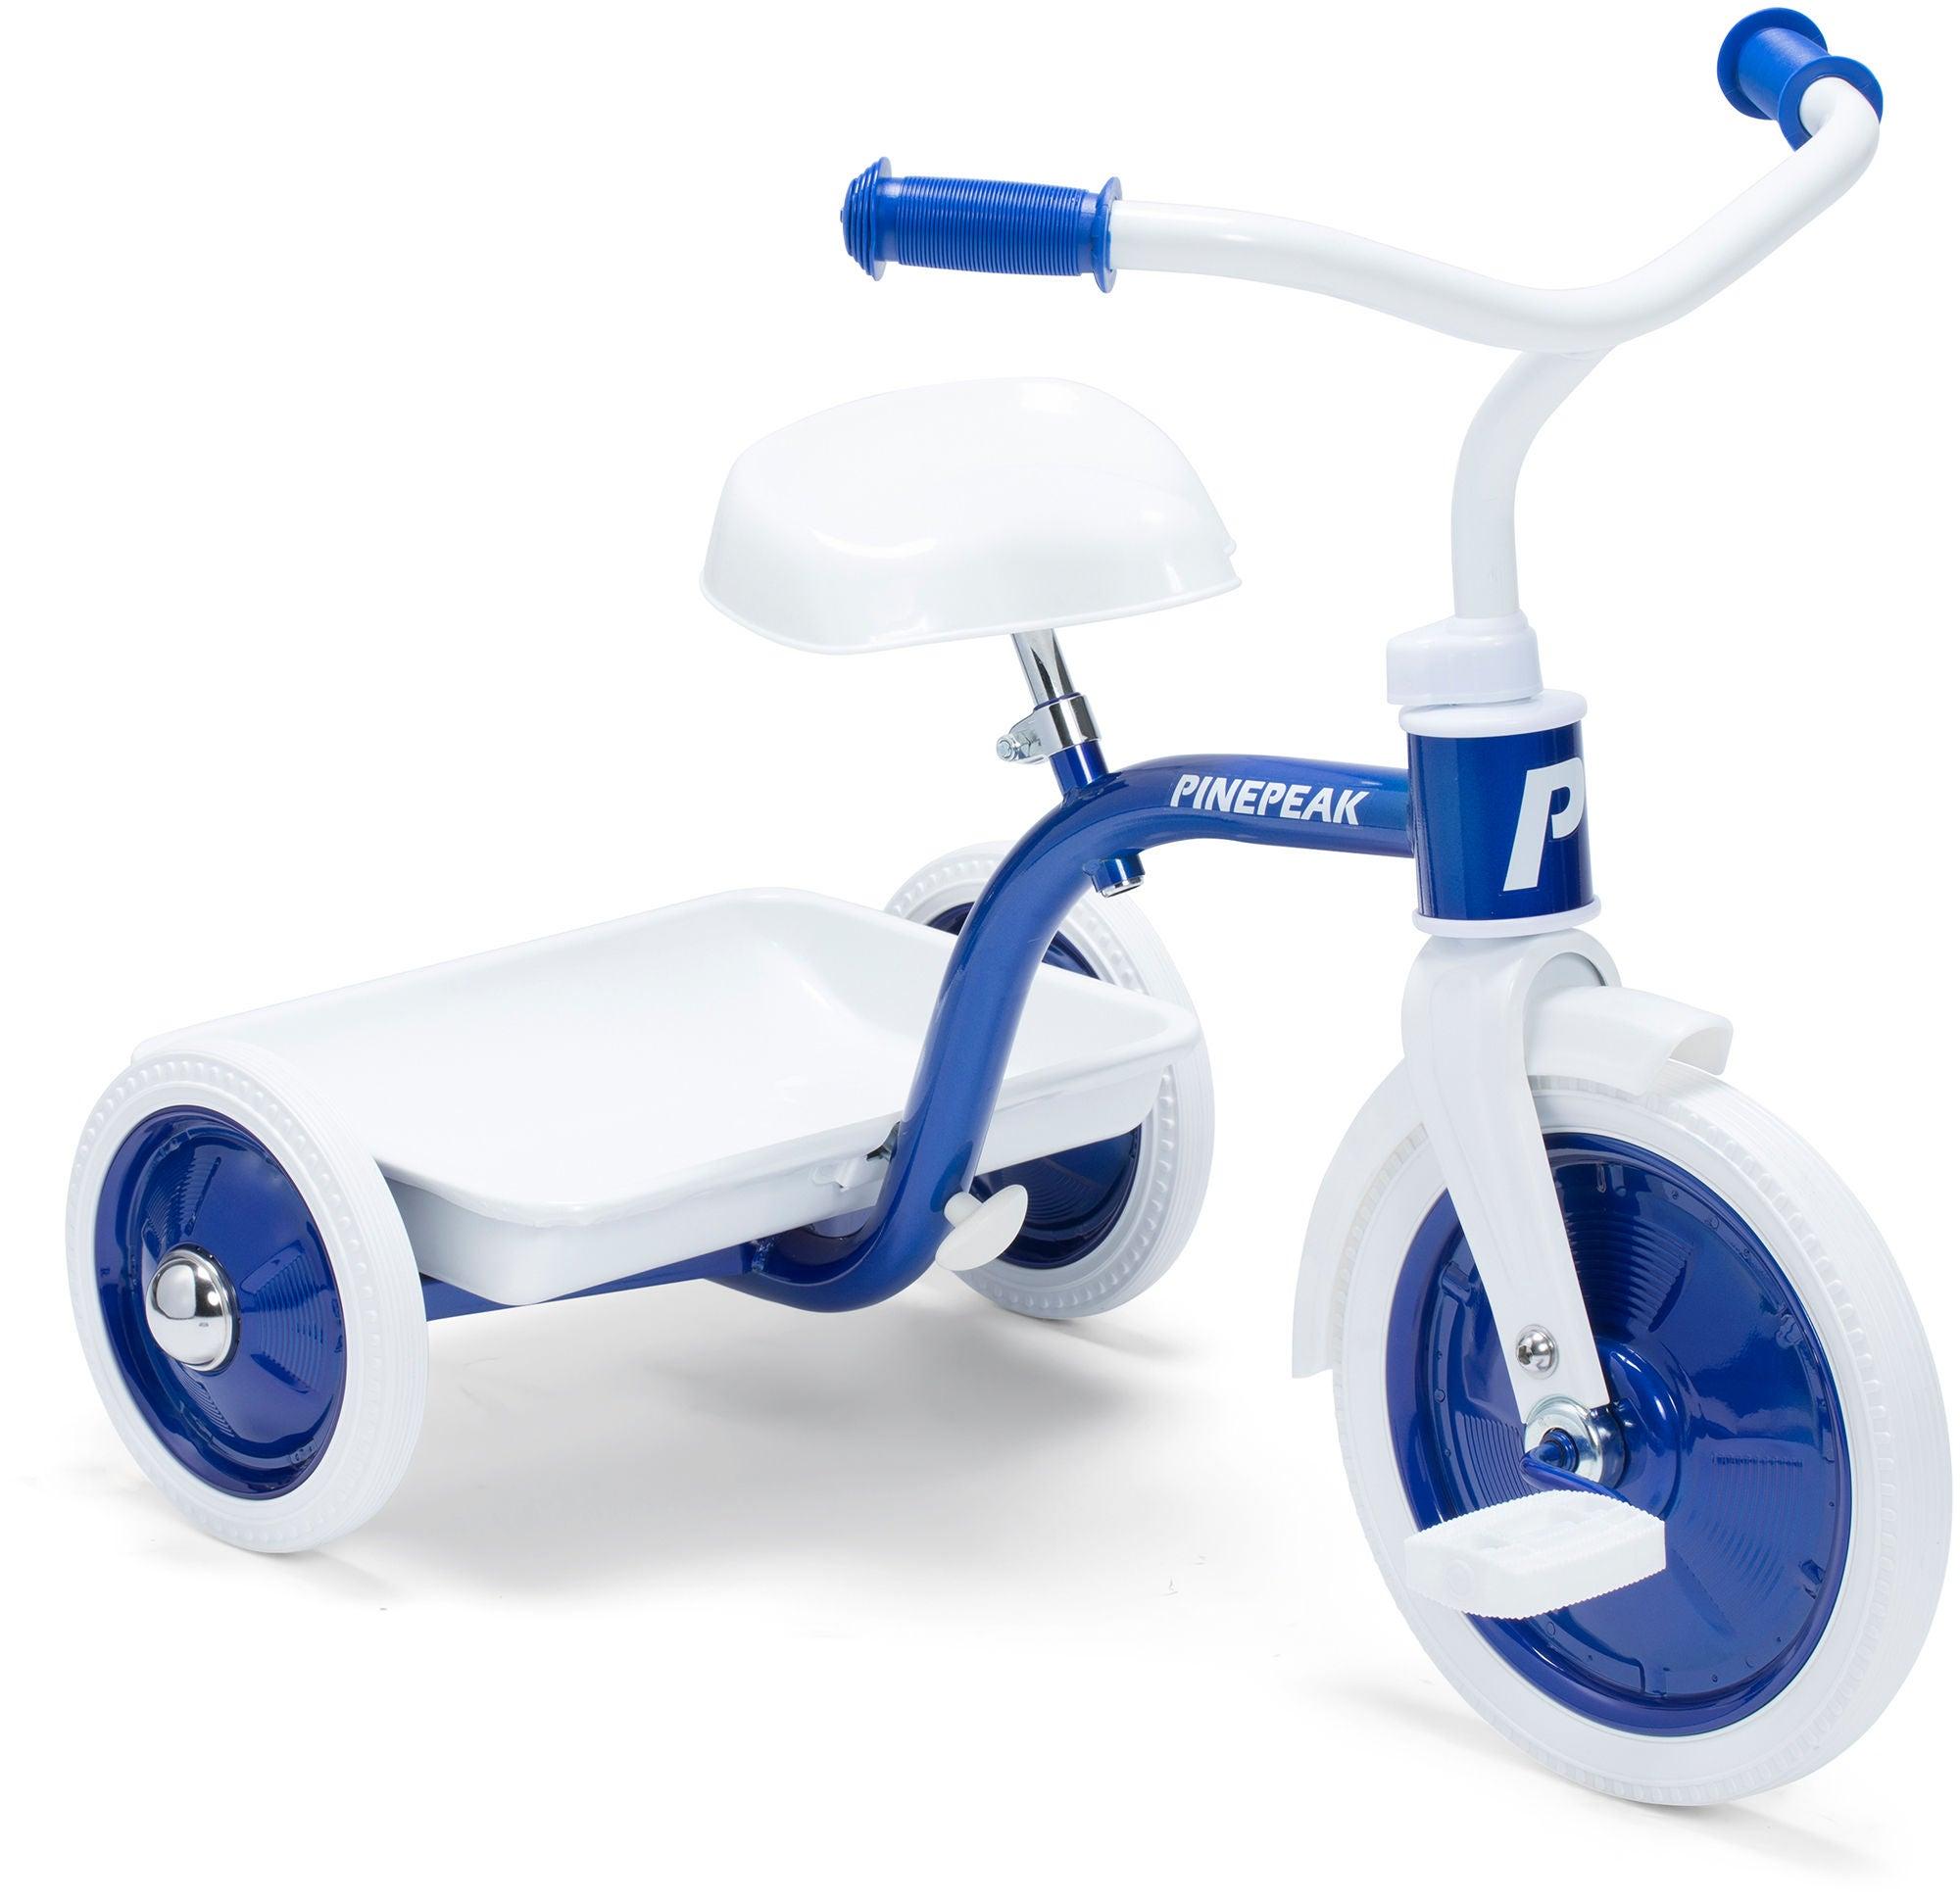 Pinepeak Trehjuling, Blå